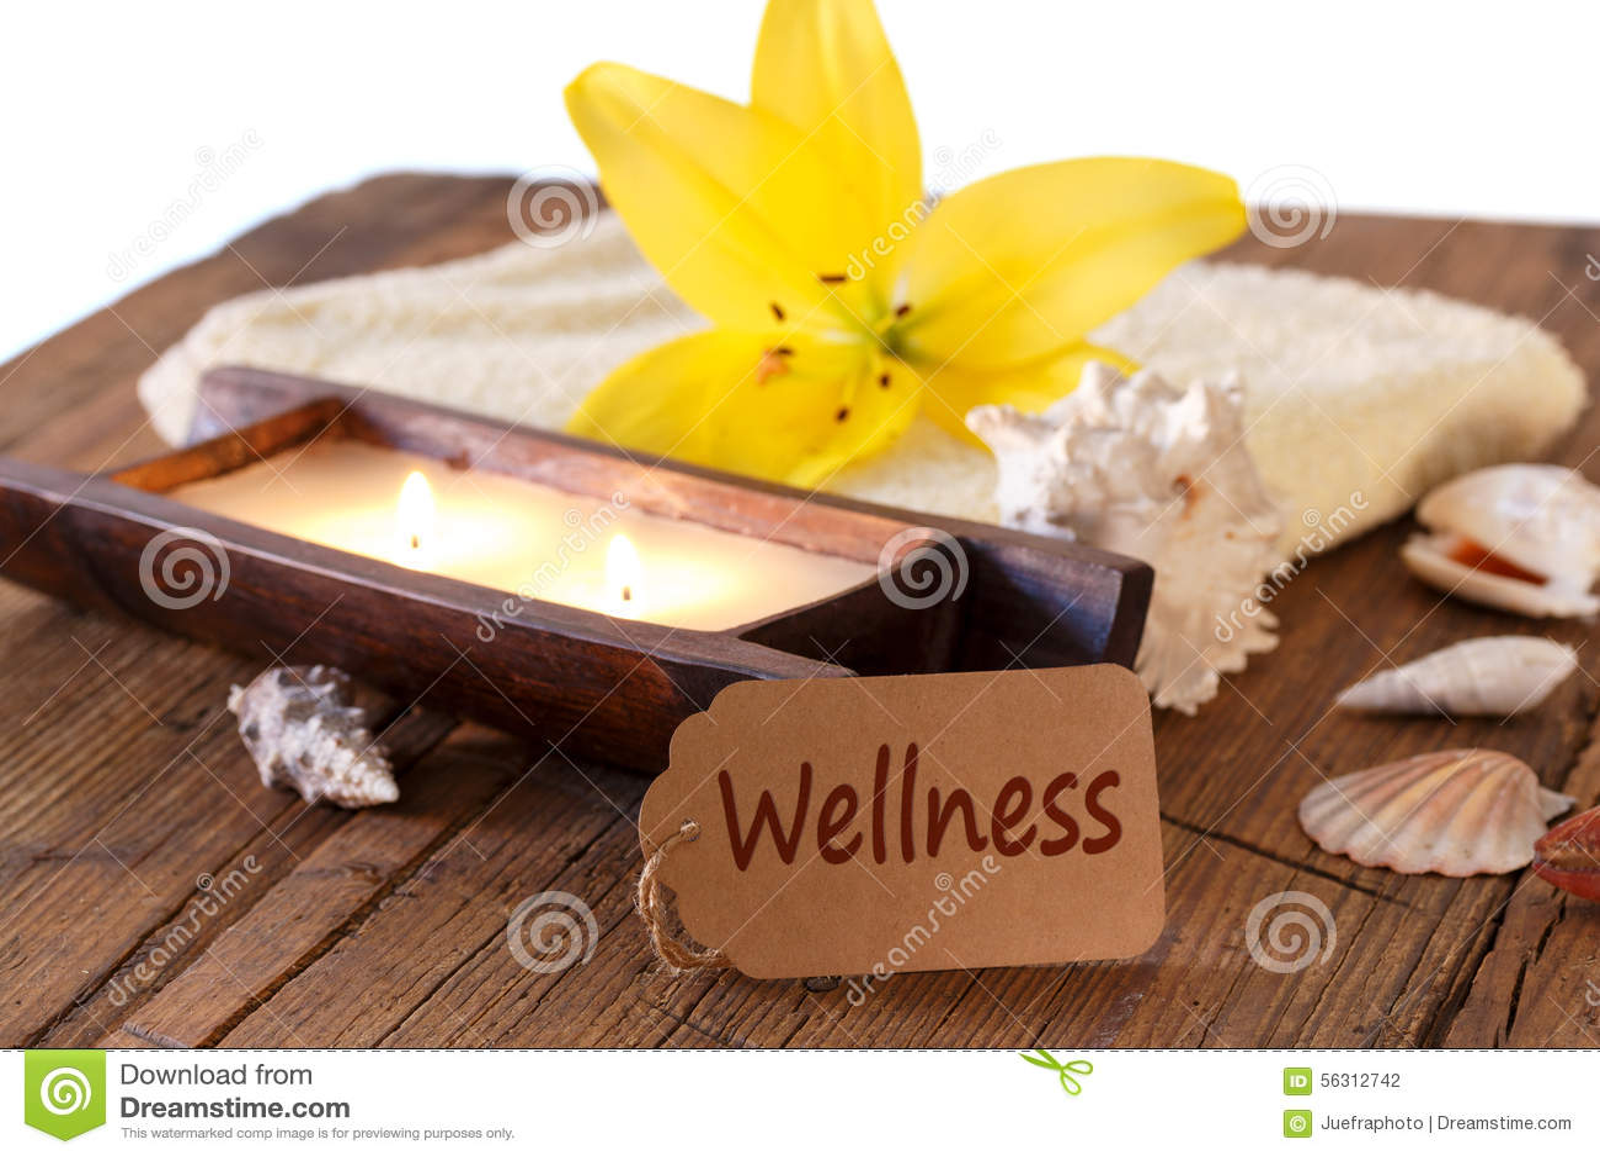 Wellness Voucher Stock Photo Image Of Decorations